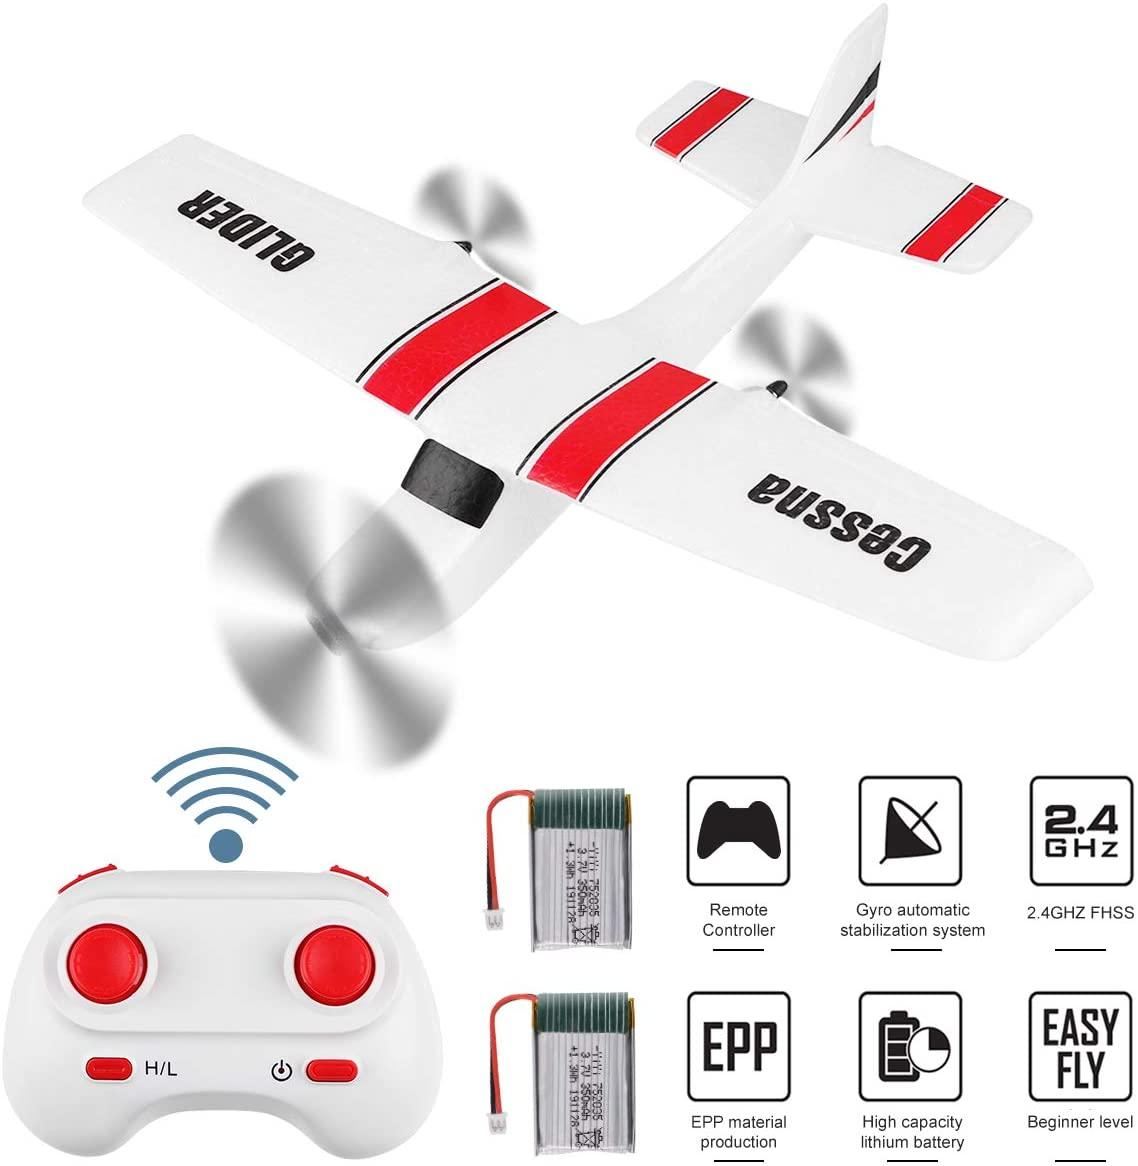 Z53 Medium Foam Glider 2 Battery Remote Control Toy 2.4ghz Epp Rc Airplane Rc Aircraft Glider white